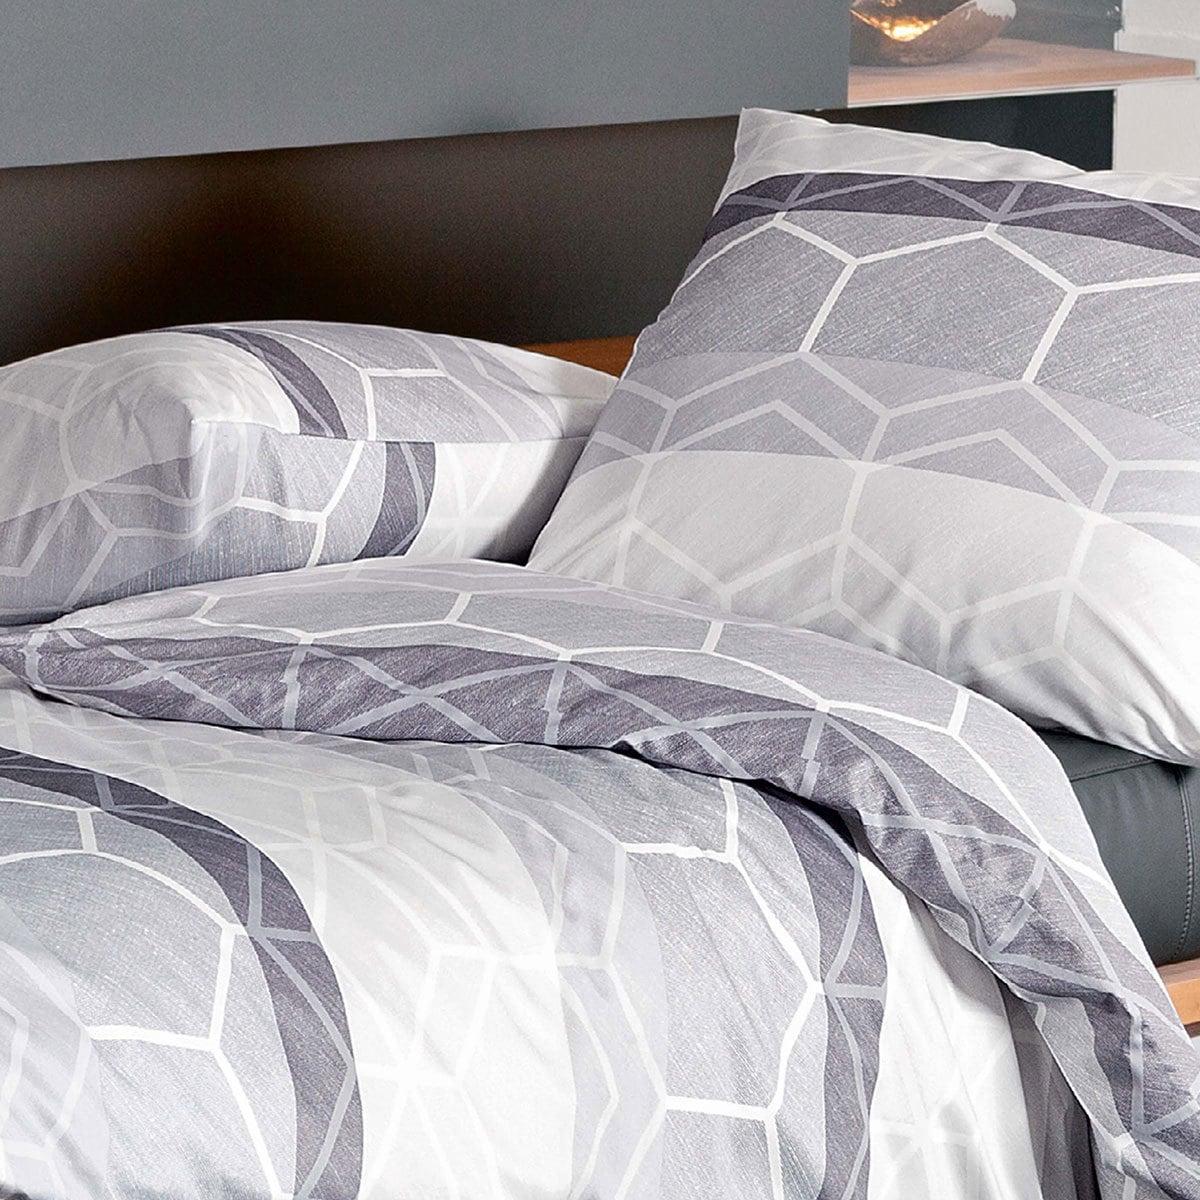 janine mako satin bettw sche moments 98017 08 g nstig online kaufen bei bettwaren shop. Black Bedroom Furniture Sets. Home Design Ideas